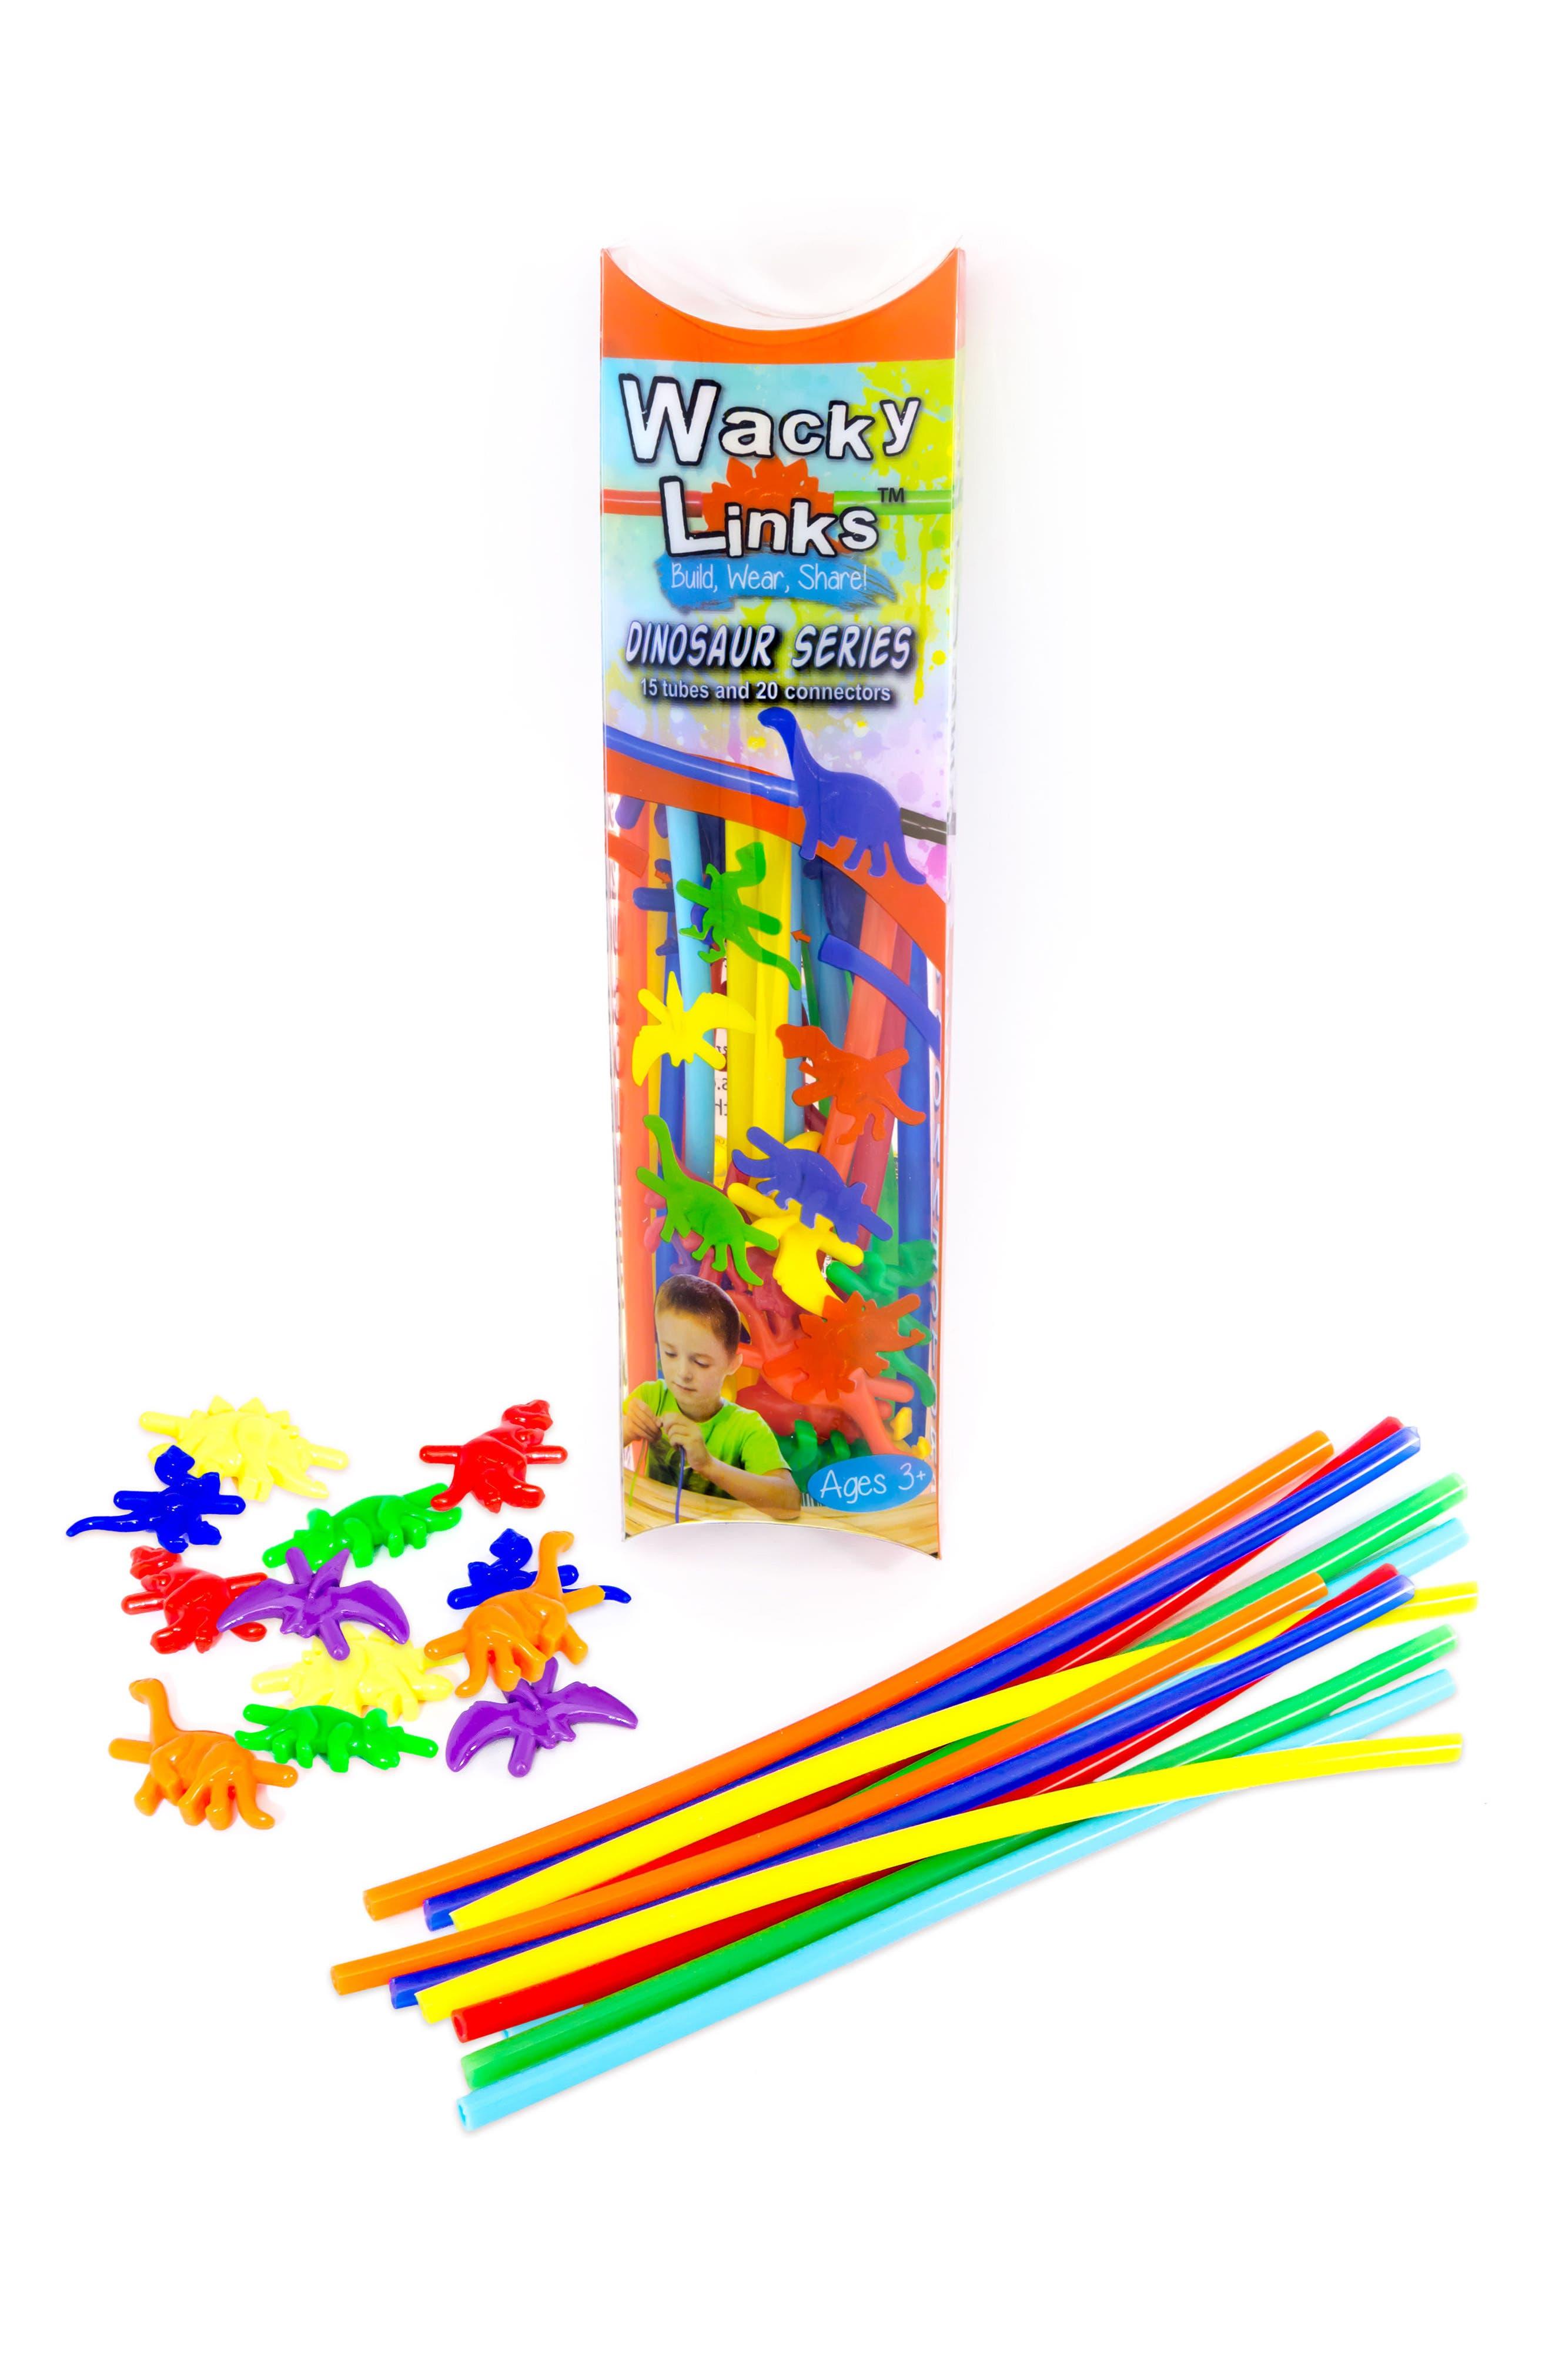 35-Piece Dinosaur Series Linking Toy Kit,                         Main,                         color,